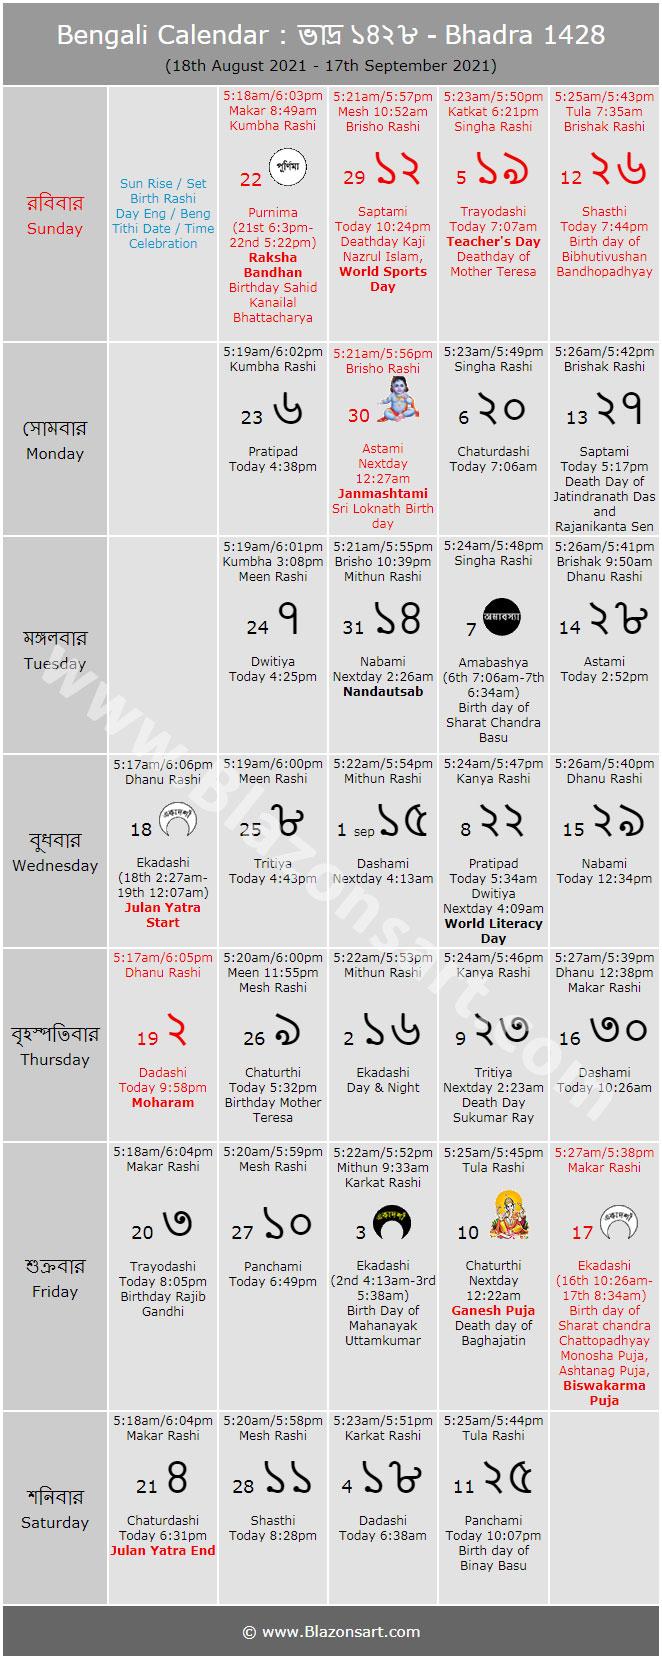 Bengali Calendar - Bhadra 1426 : বাংলা কালেন্ডার